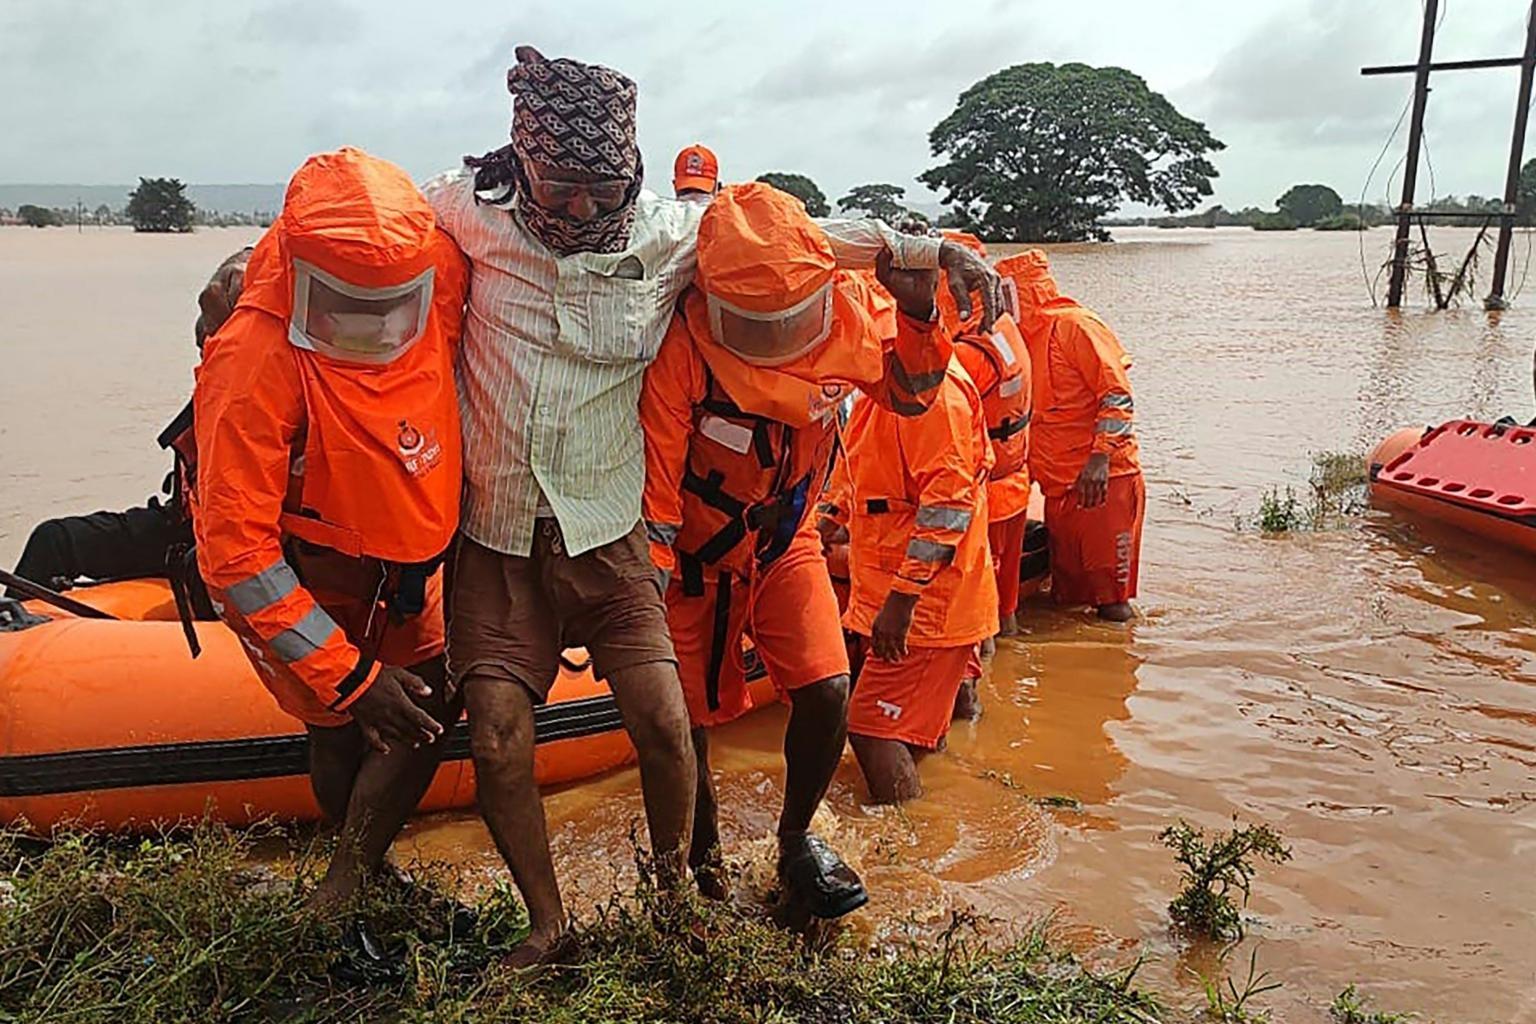 India begins landslide, flood clean-up as deadly monsoon rains ease